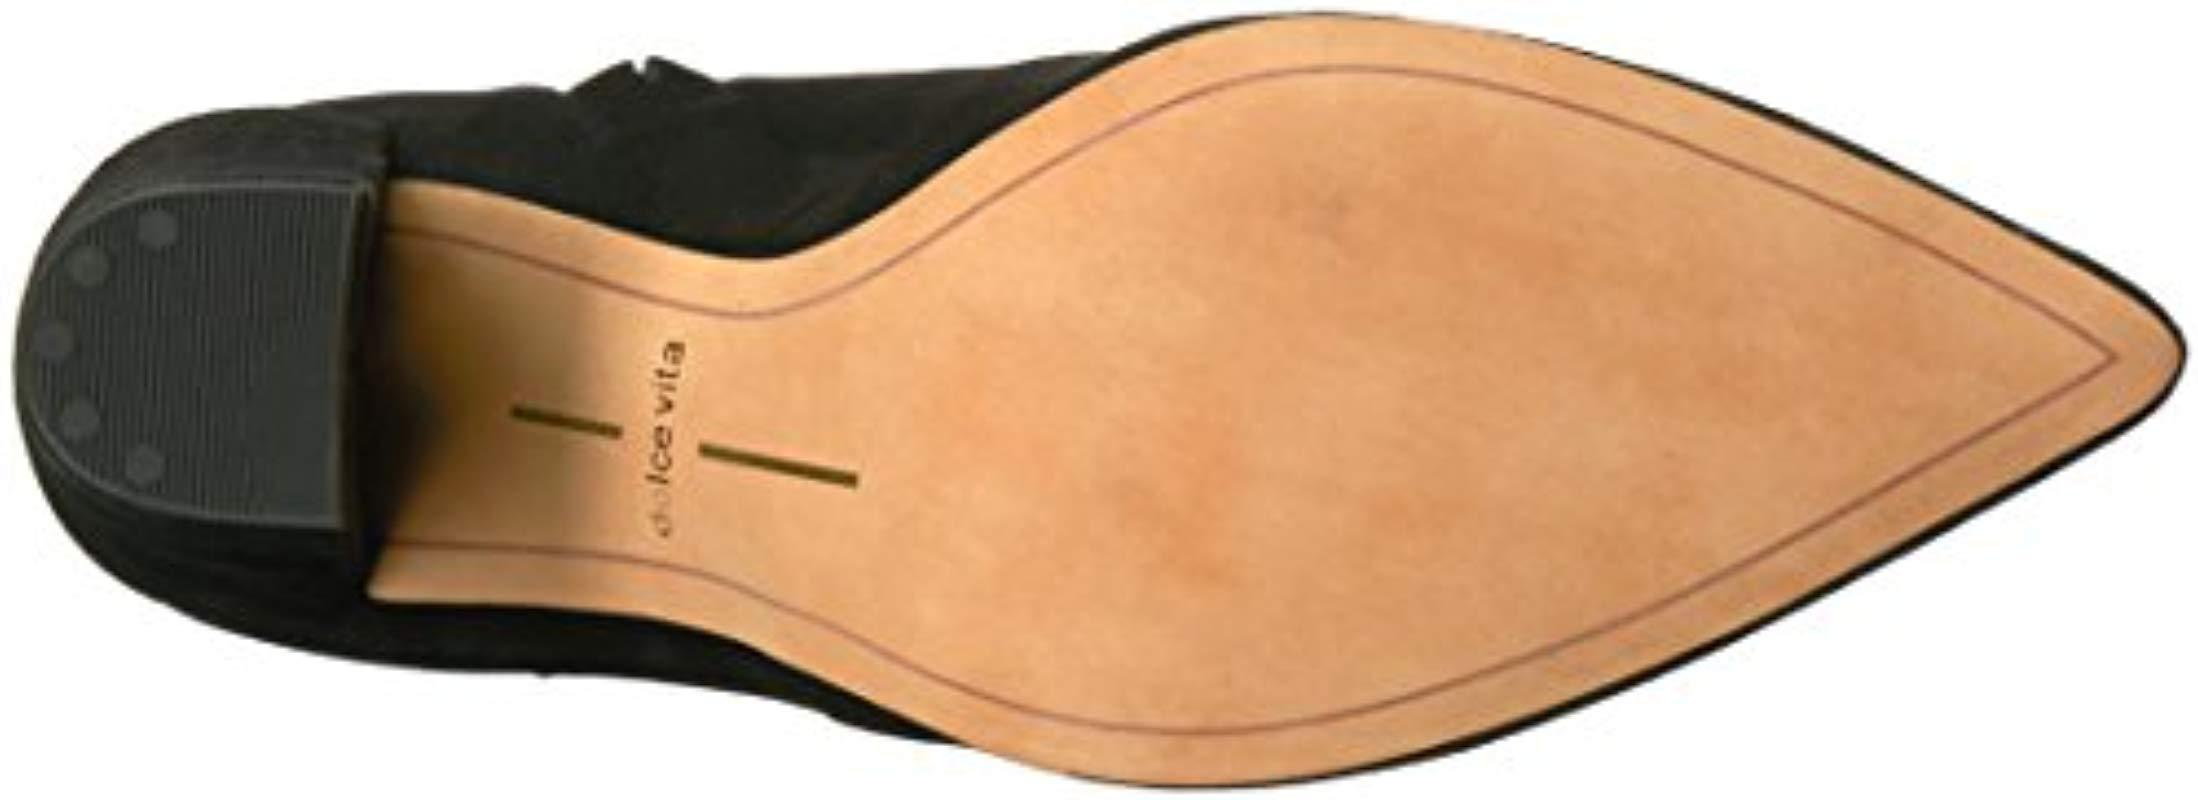 4a15fbcce81c8b Lyst - Dolce Vita Emmy Fashion Boot in Black